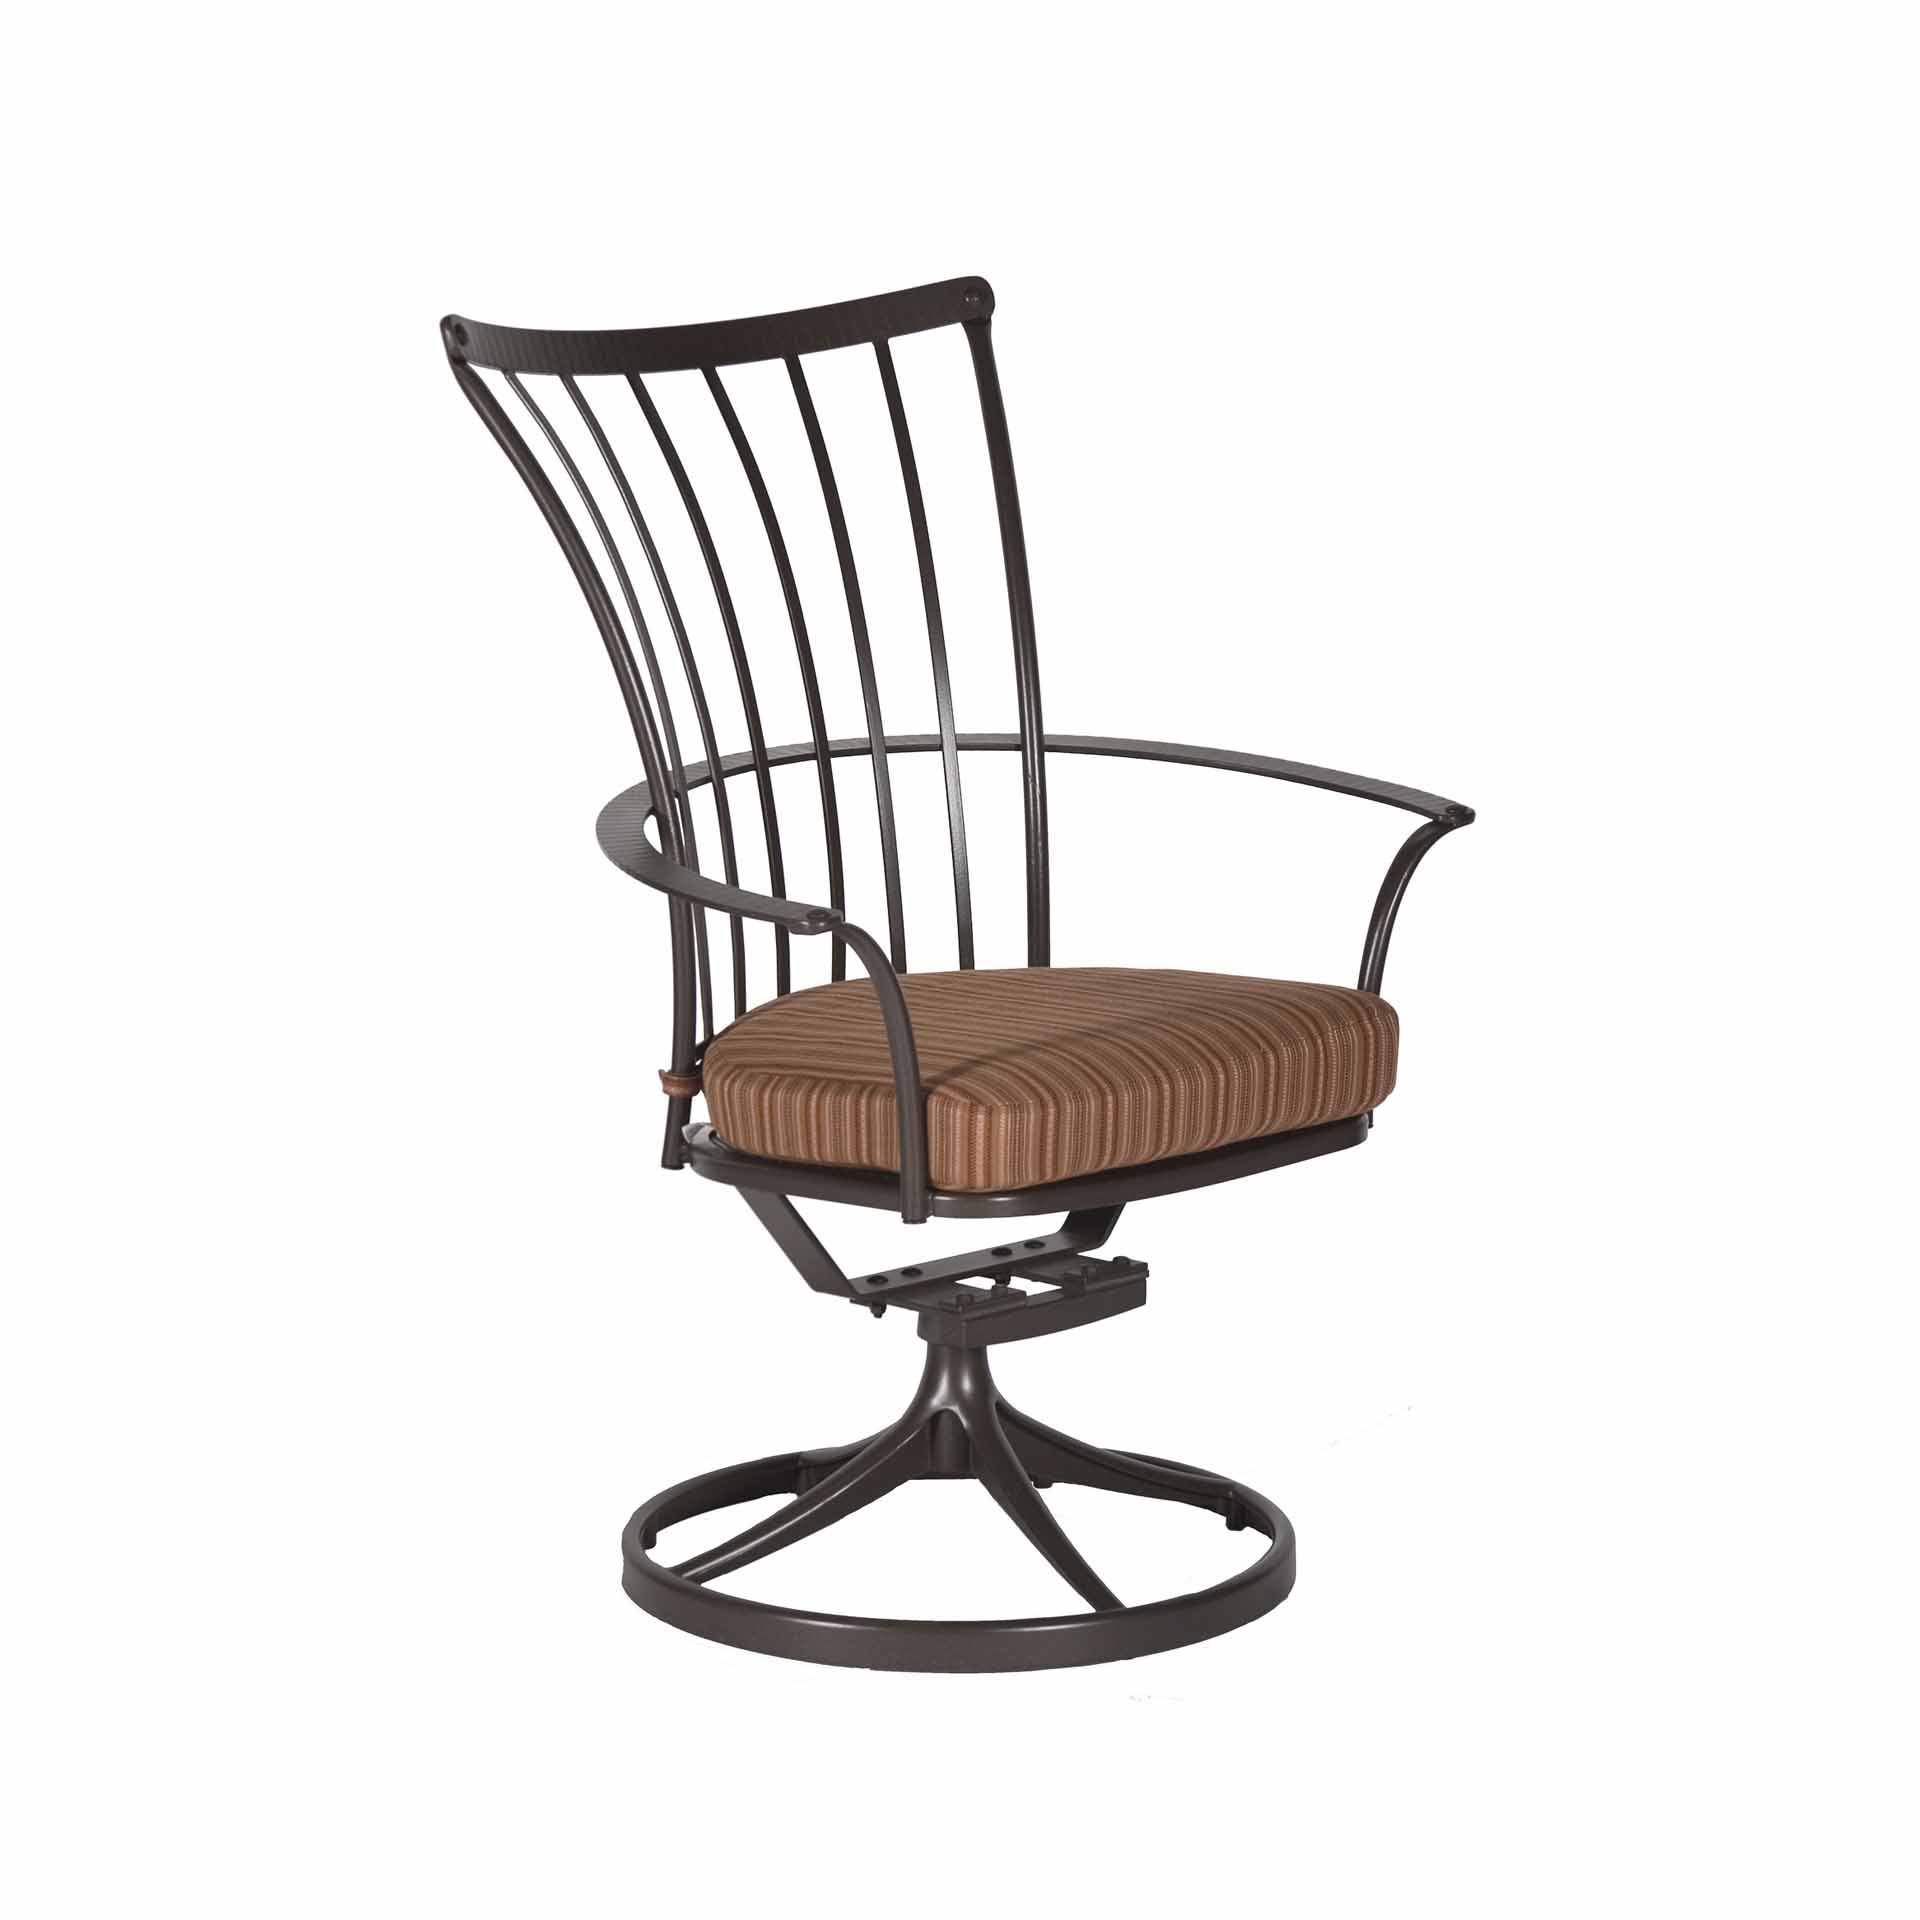 Ow Lee Monterra Dining Swivel Rocker Arm Chair Leisure